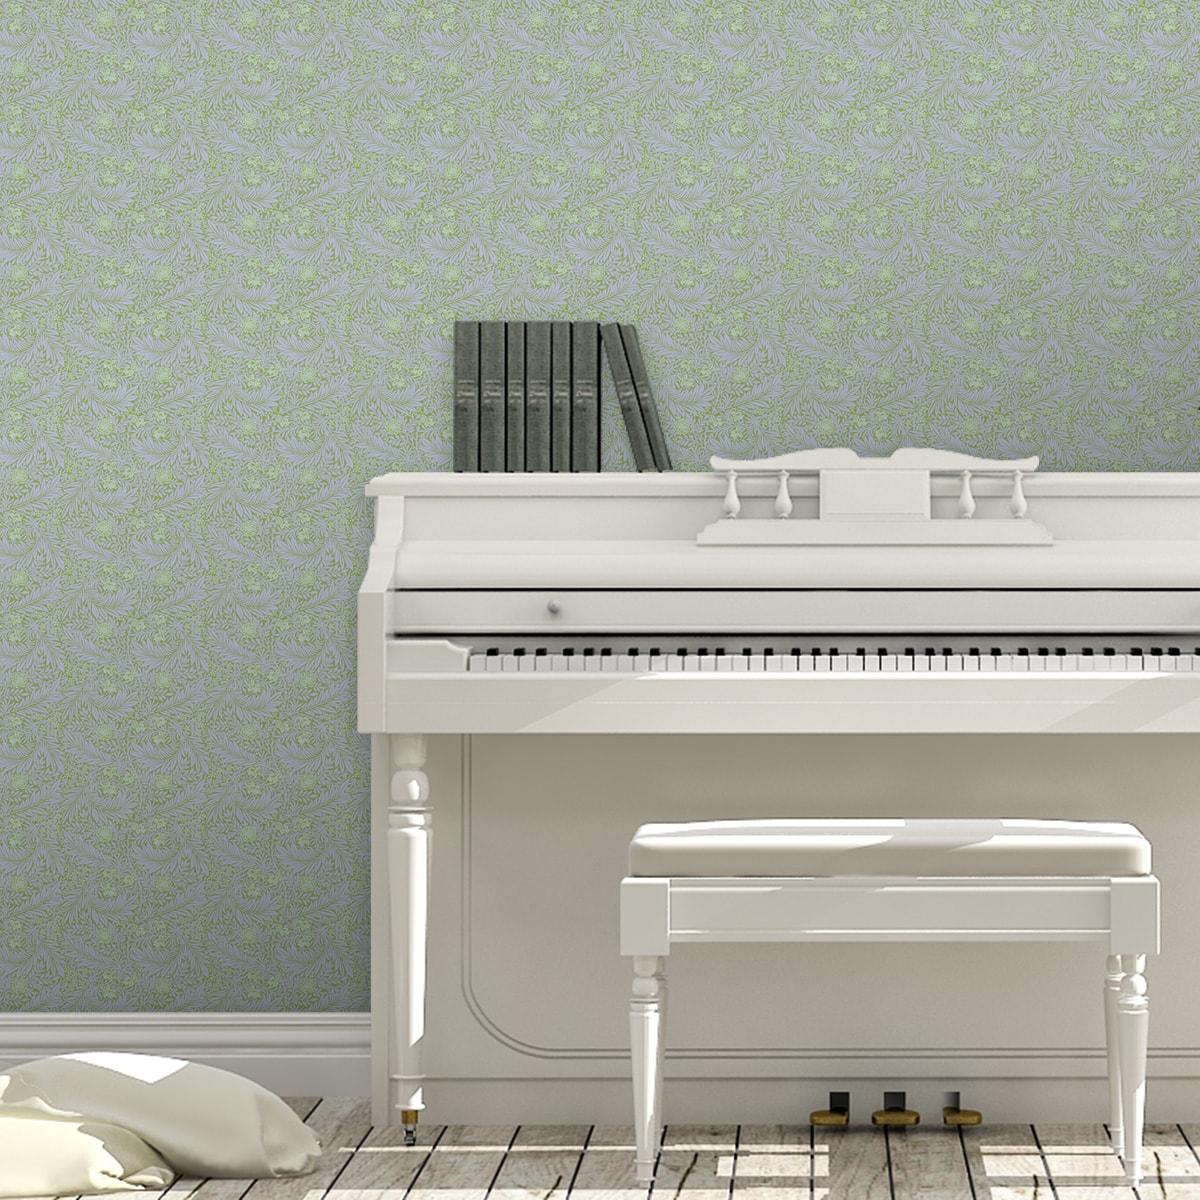 Tapete Wohnzimmer violett: Lila grüne Jugendstil Tapete